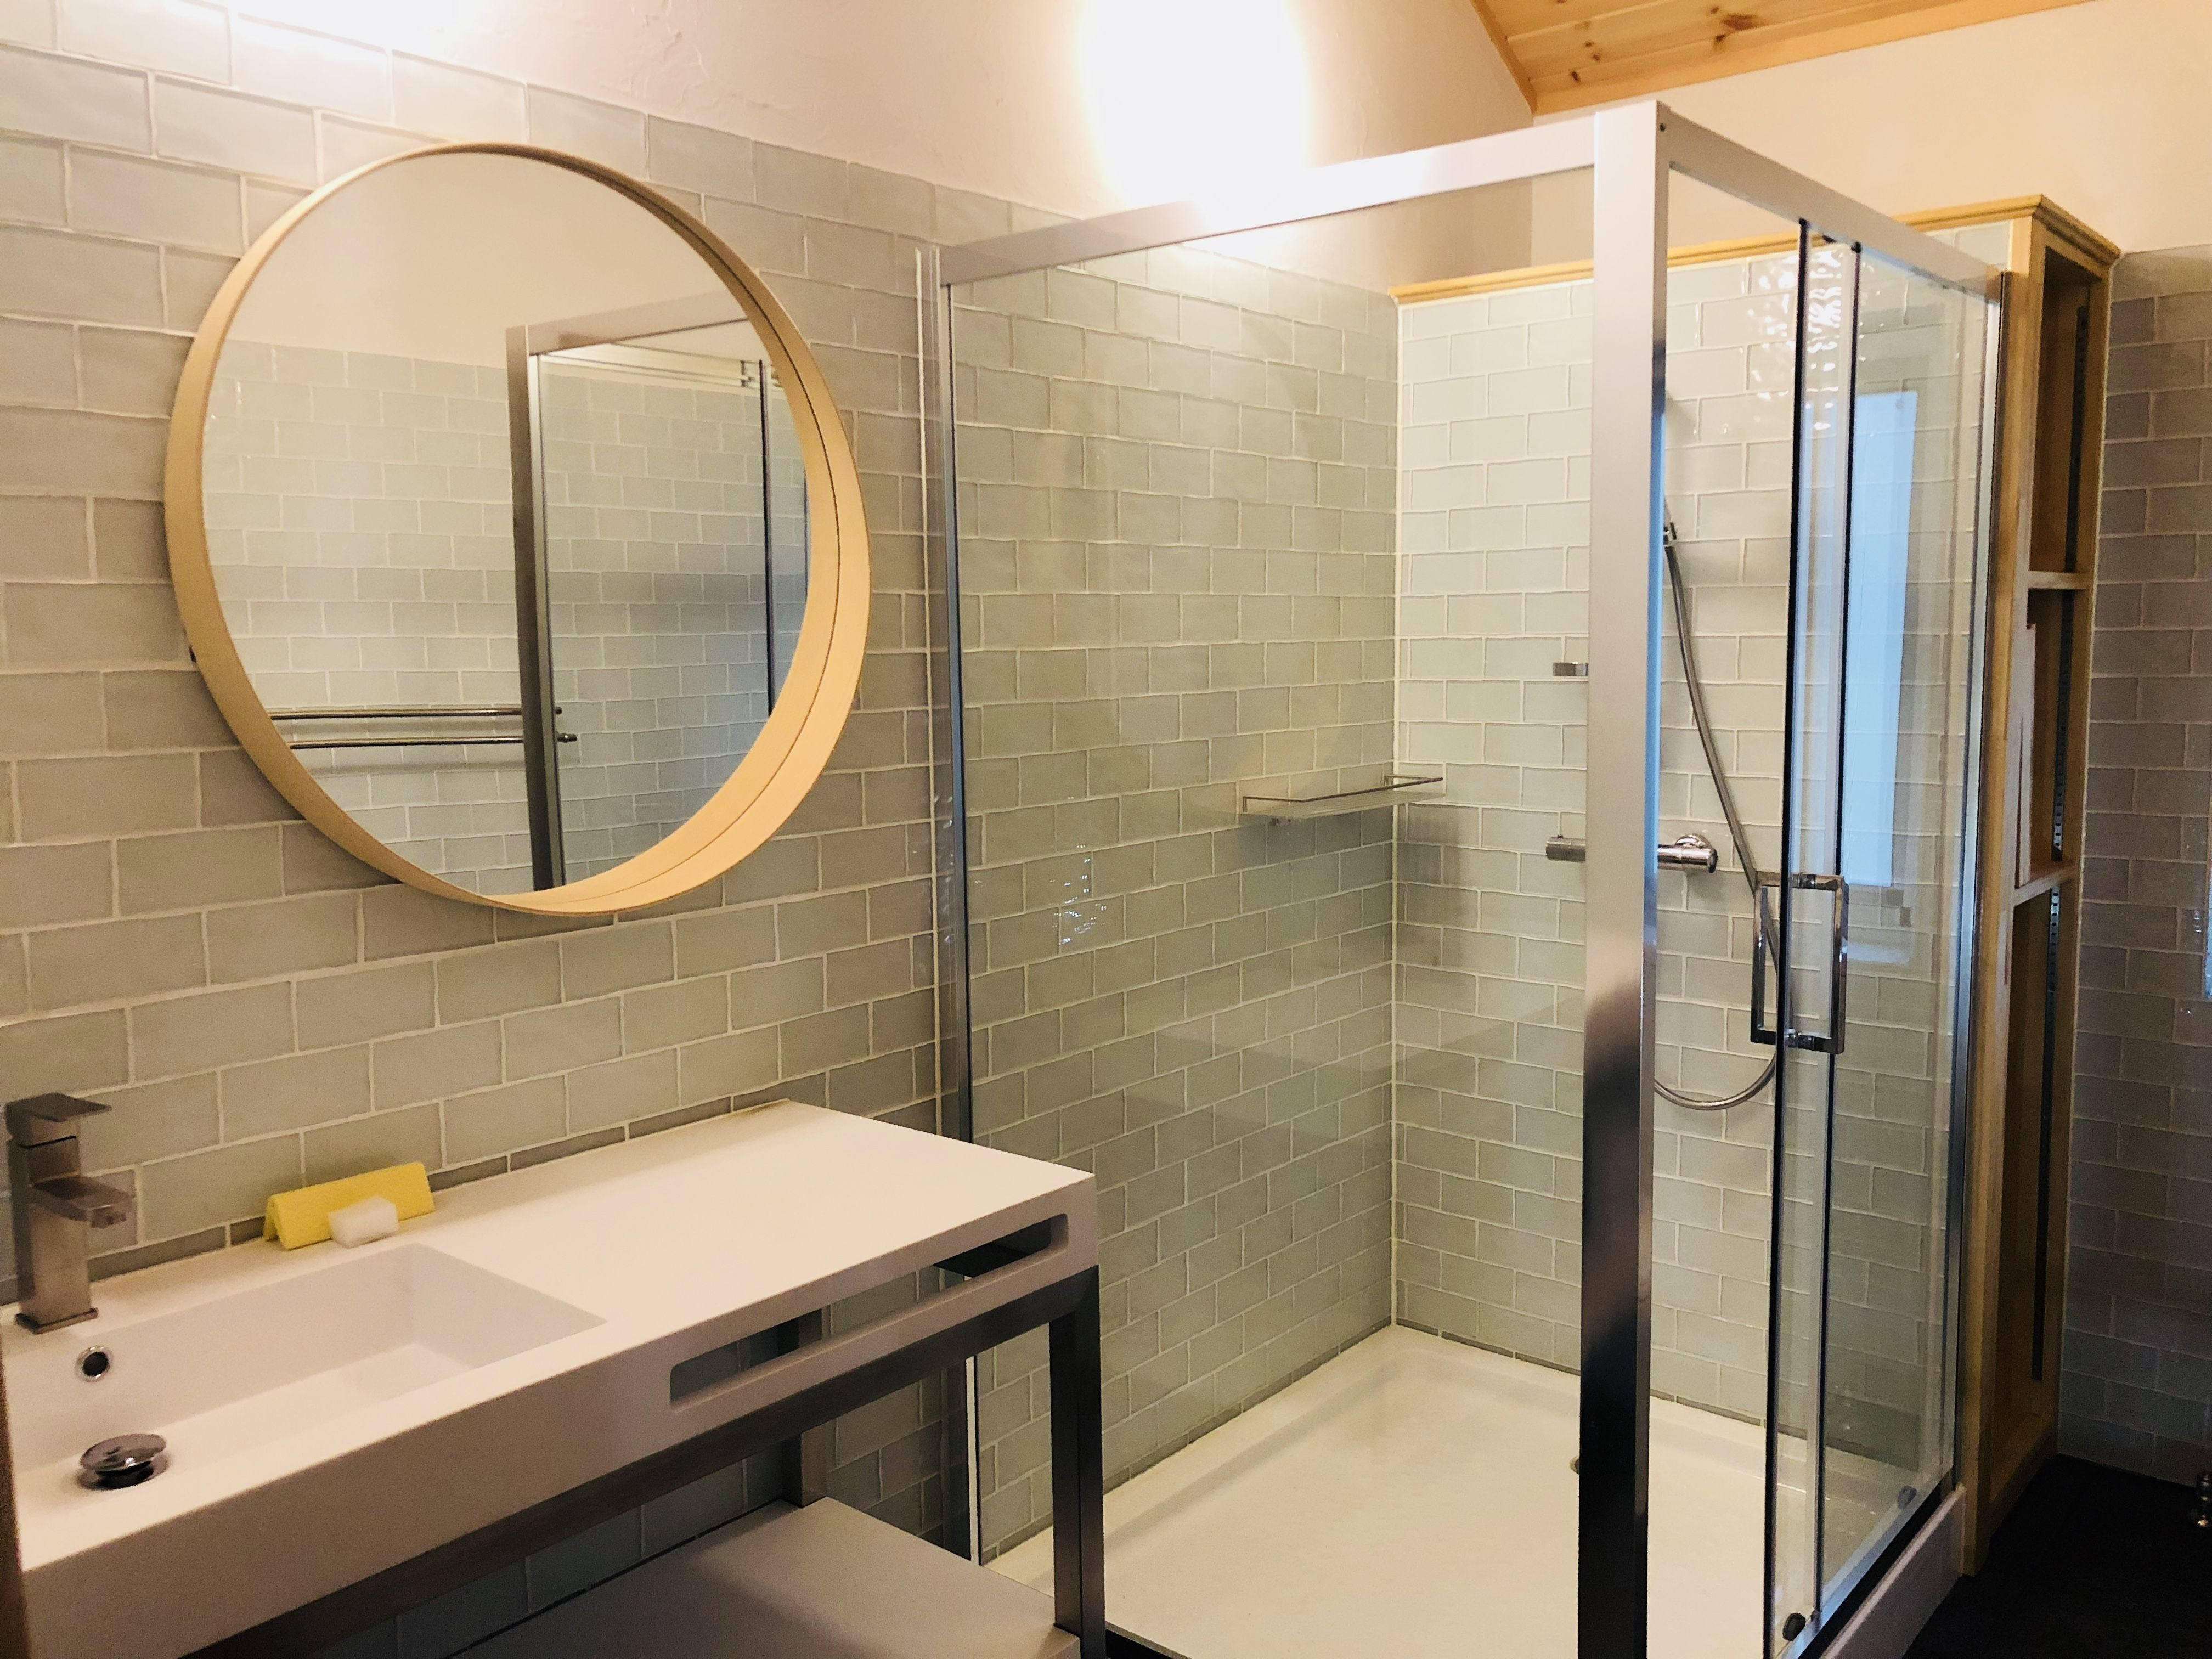 Bathroom 2 Shower Box Toilet Round Mirror Bathroom Bathroom Mirror Winter House